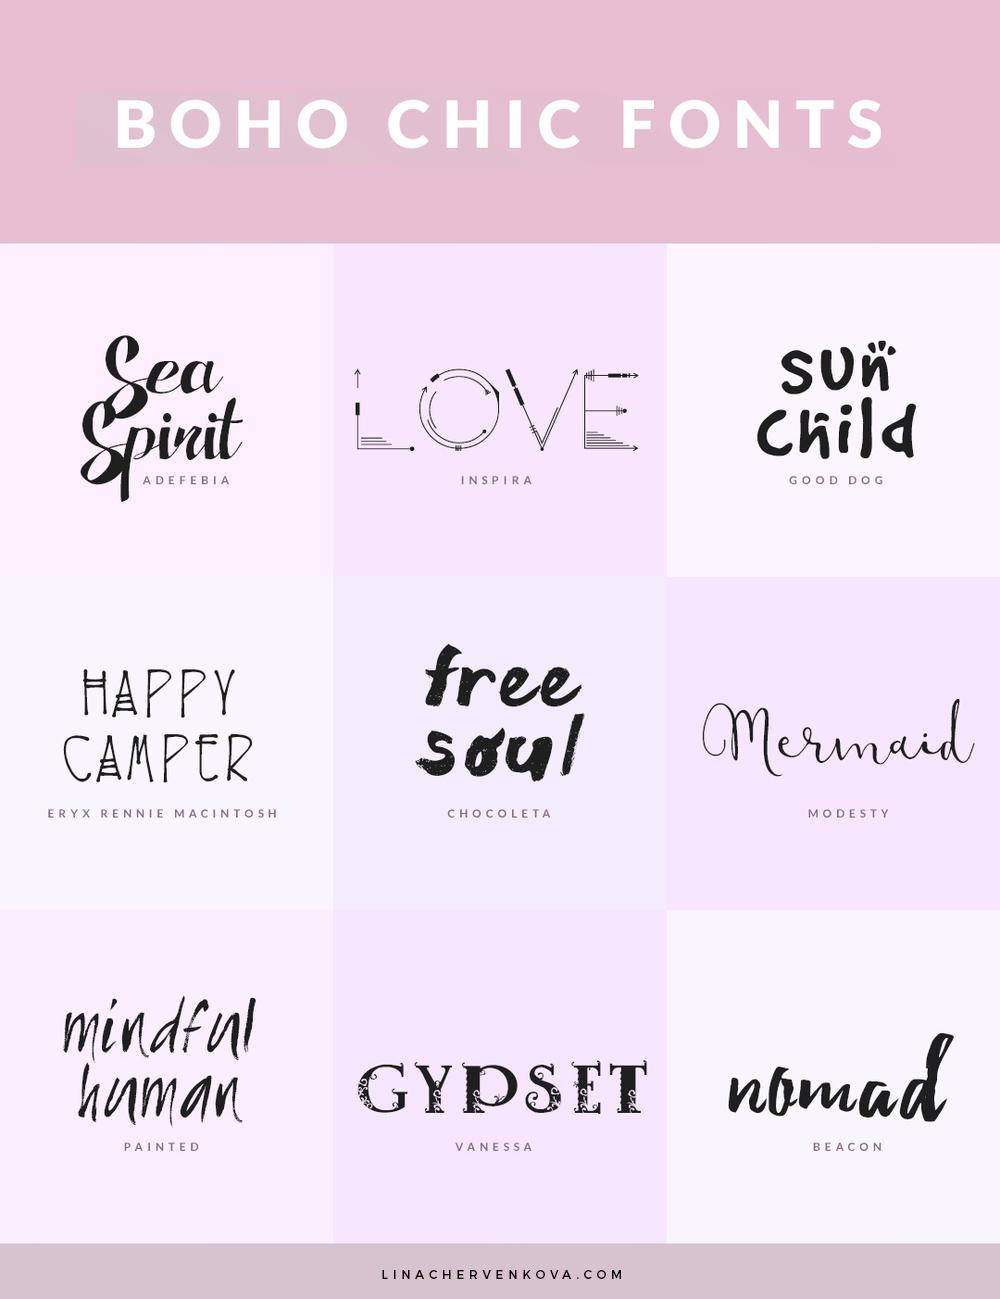 9 Free Boho Chic Fonts | linachervenkova.com